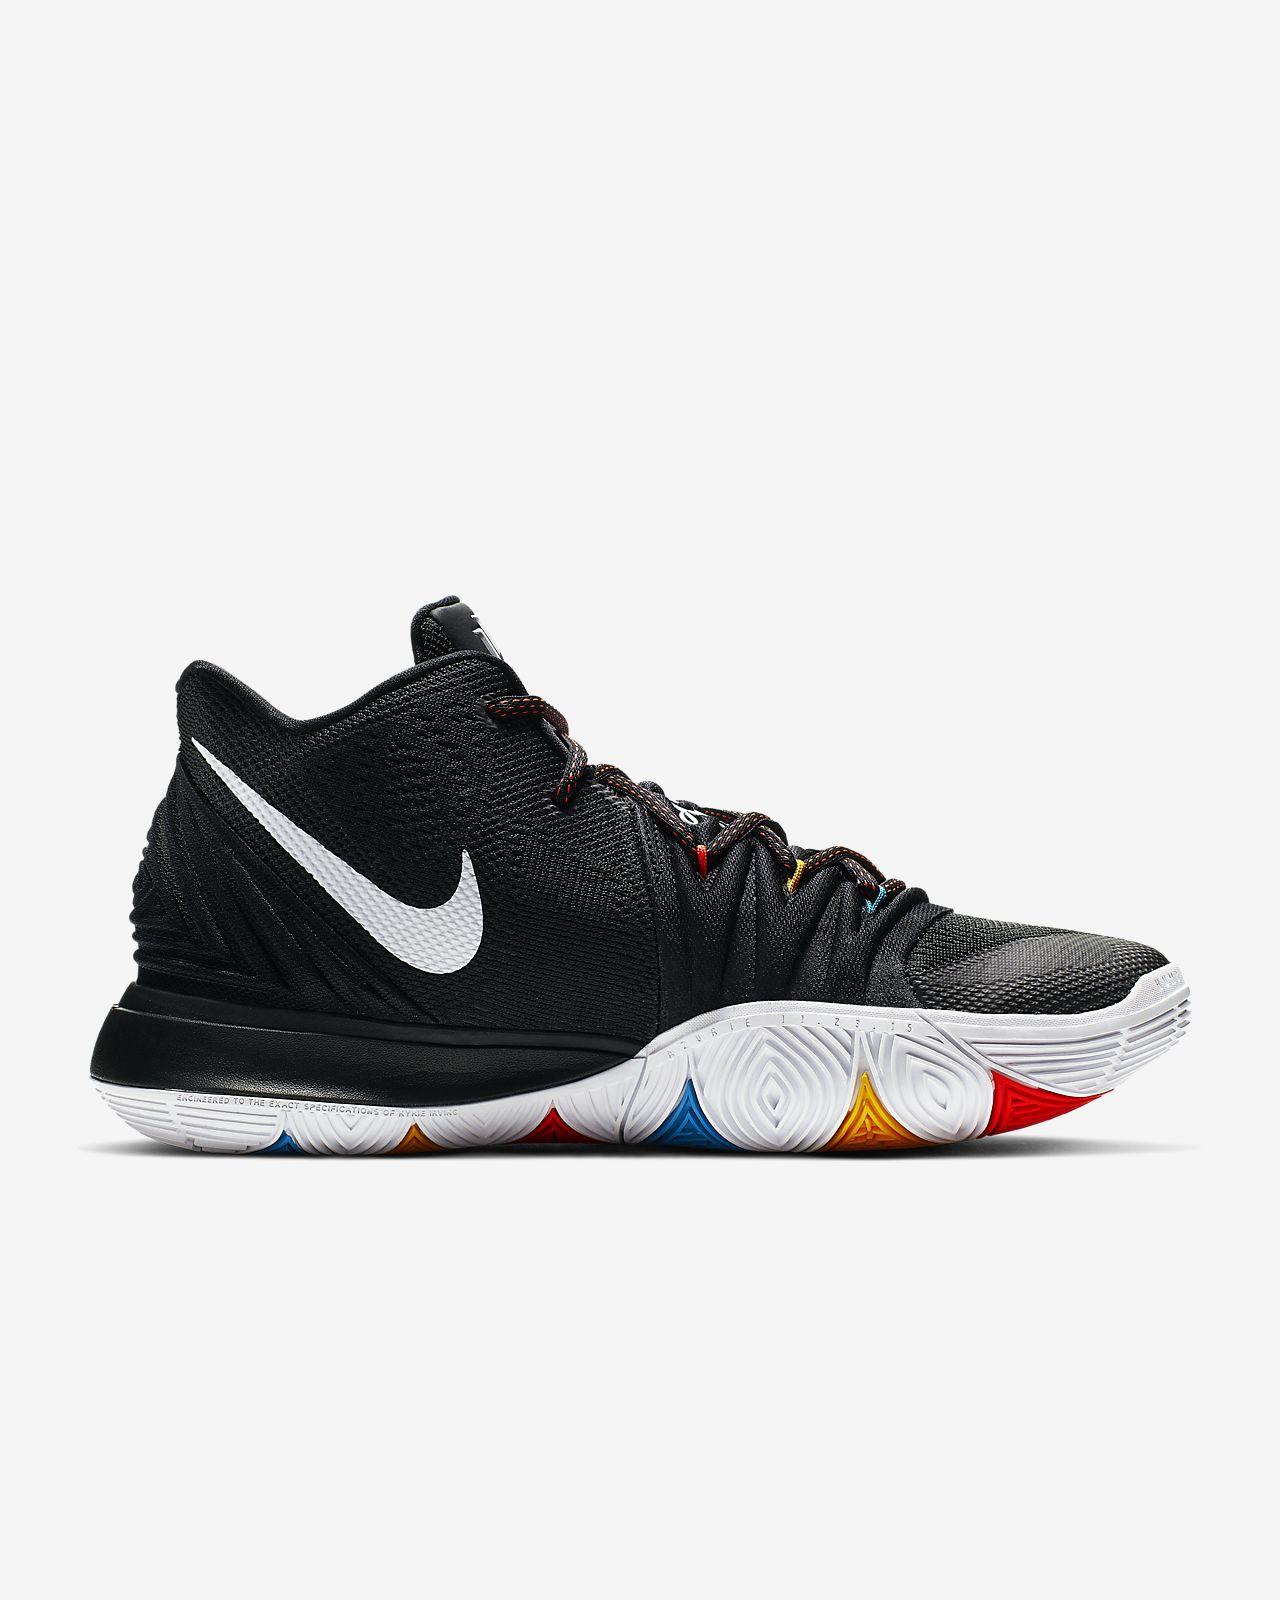 2df011cdae2492 Kyrie 5 x Friends Basketball Shoe. Nike.com